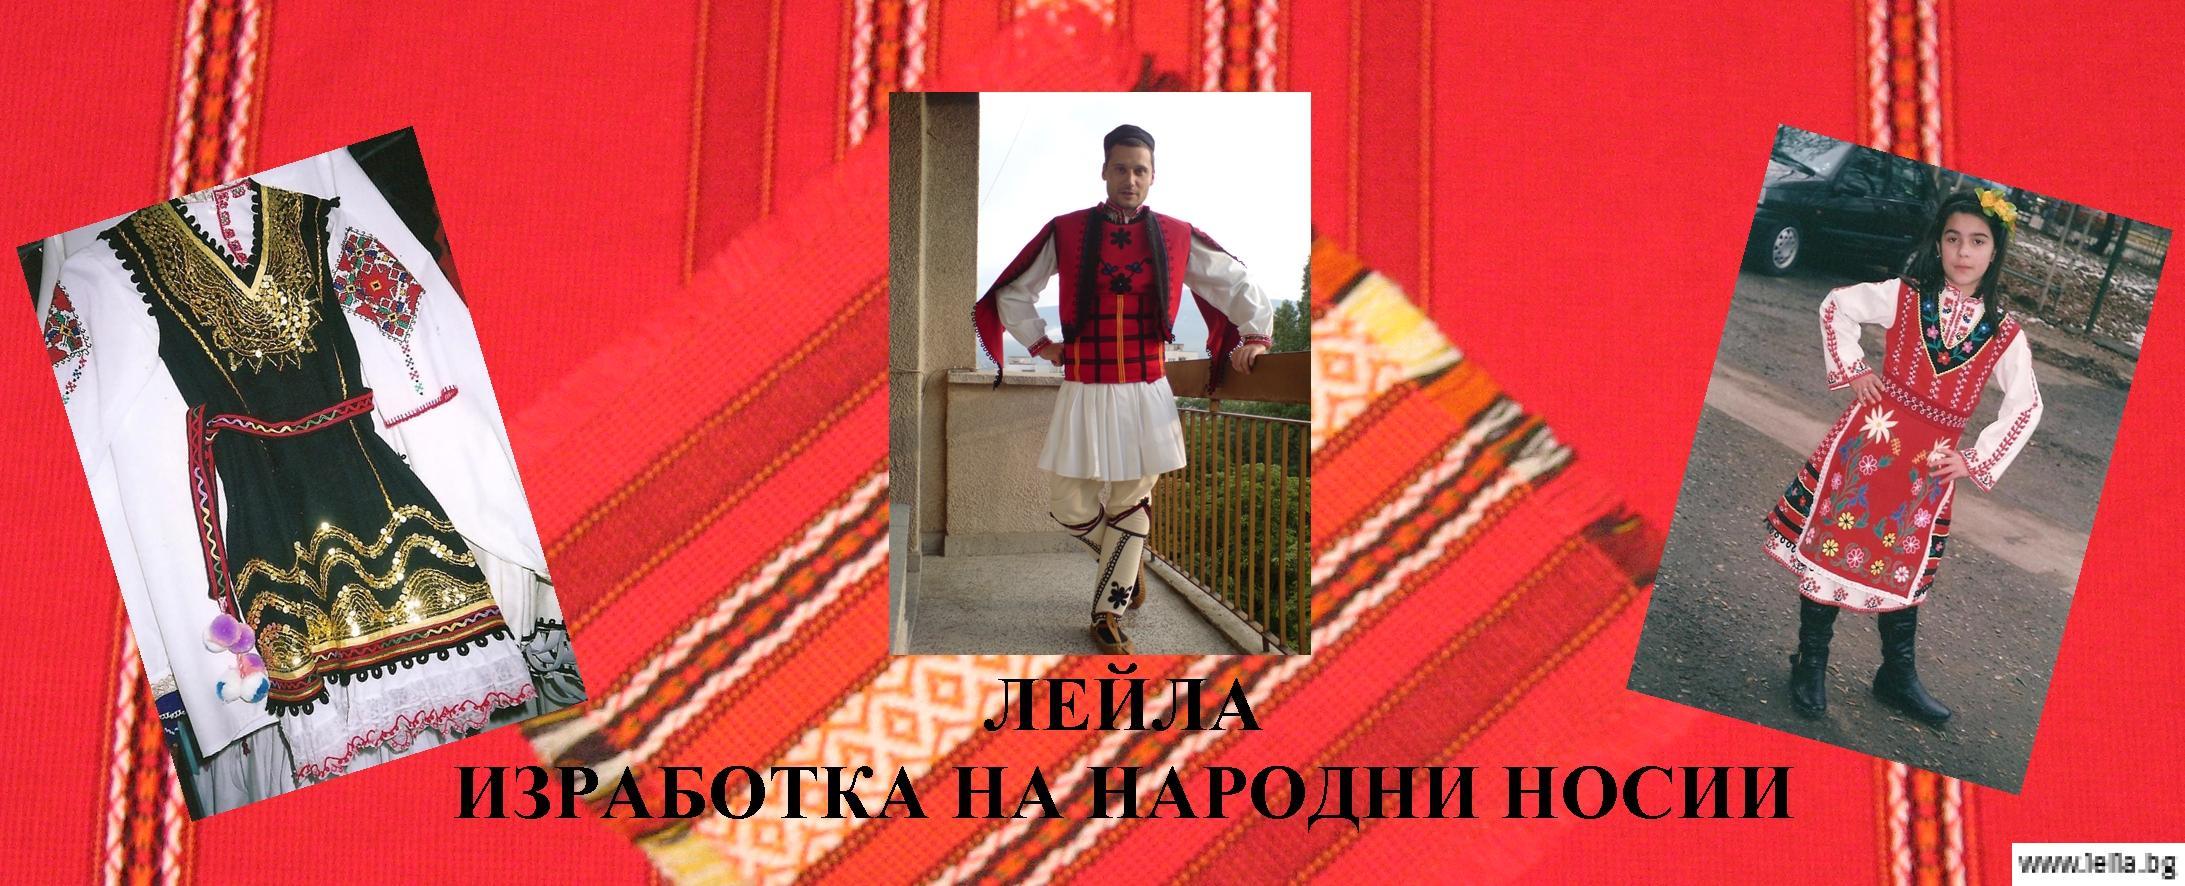 Ателие за народни носии Лейла